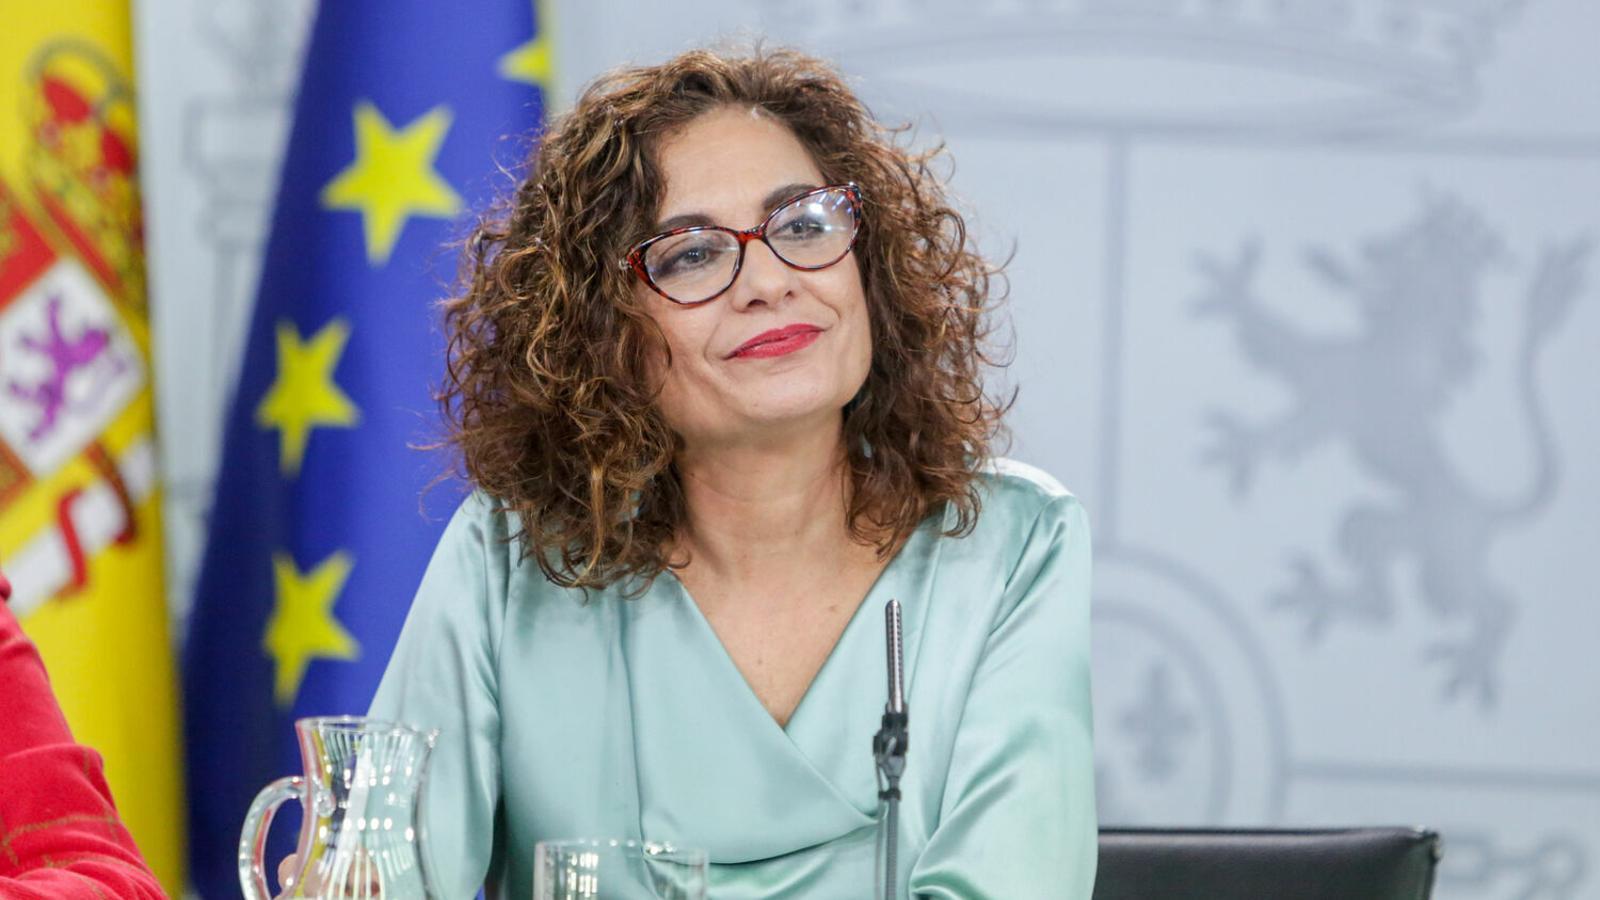 La portaveu del Govern i ministra d'hisenda, Maria Jesús Montero